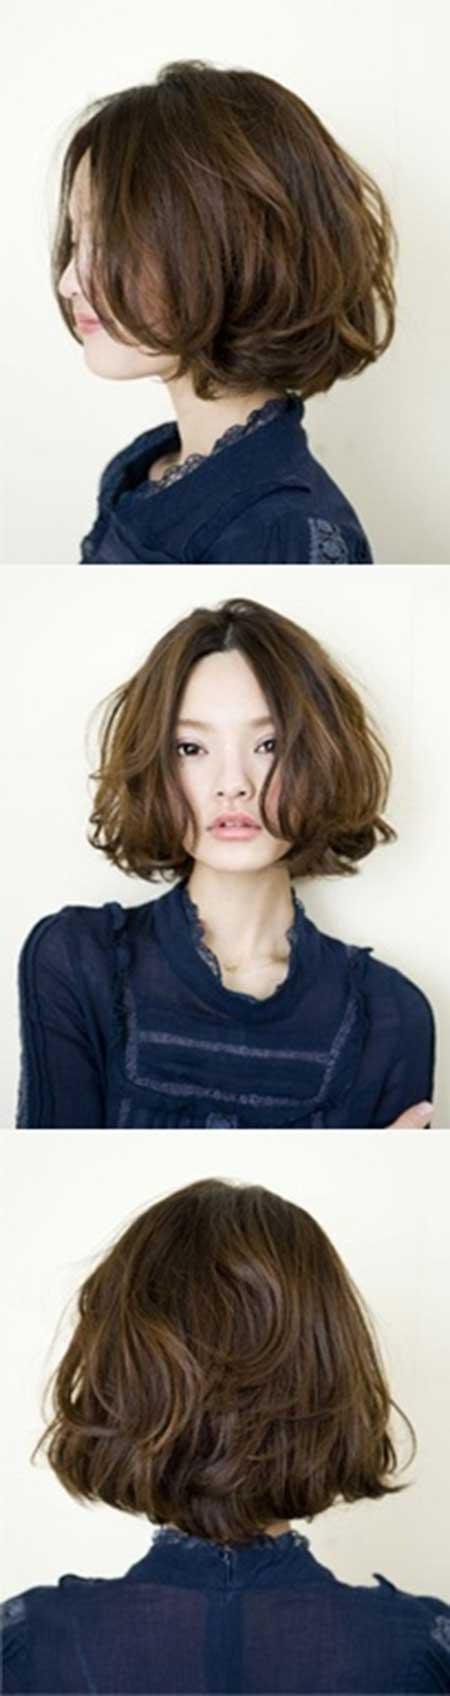 20 Haircuts For Short Wavy Hair Short Hairstyles 2017 2018